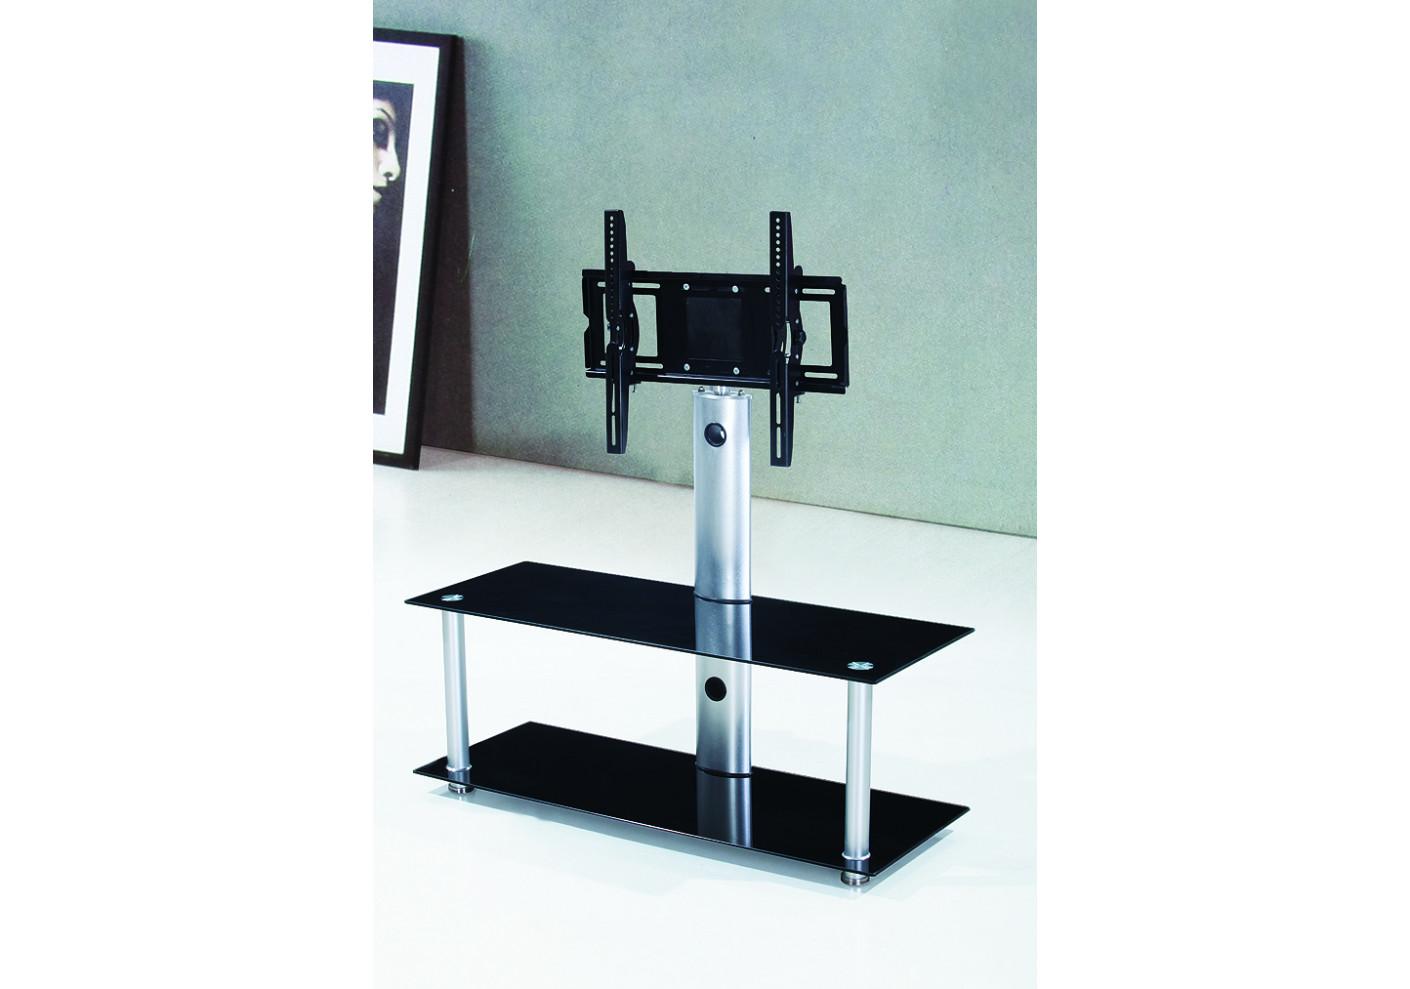 meuble television ecran plat maison design. Black Bedroom Furniture Sets. Home Design Ideas